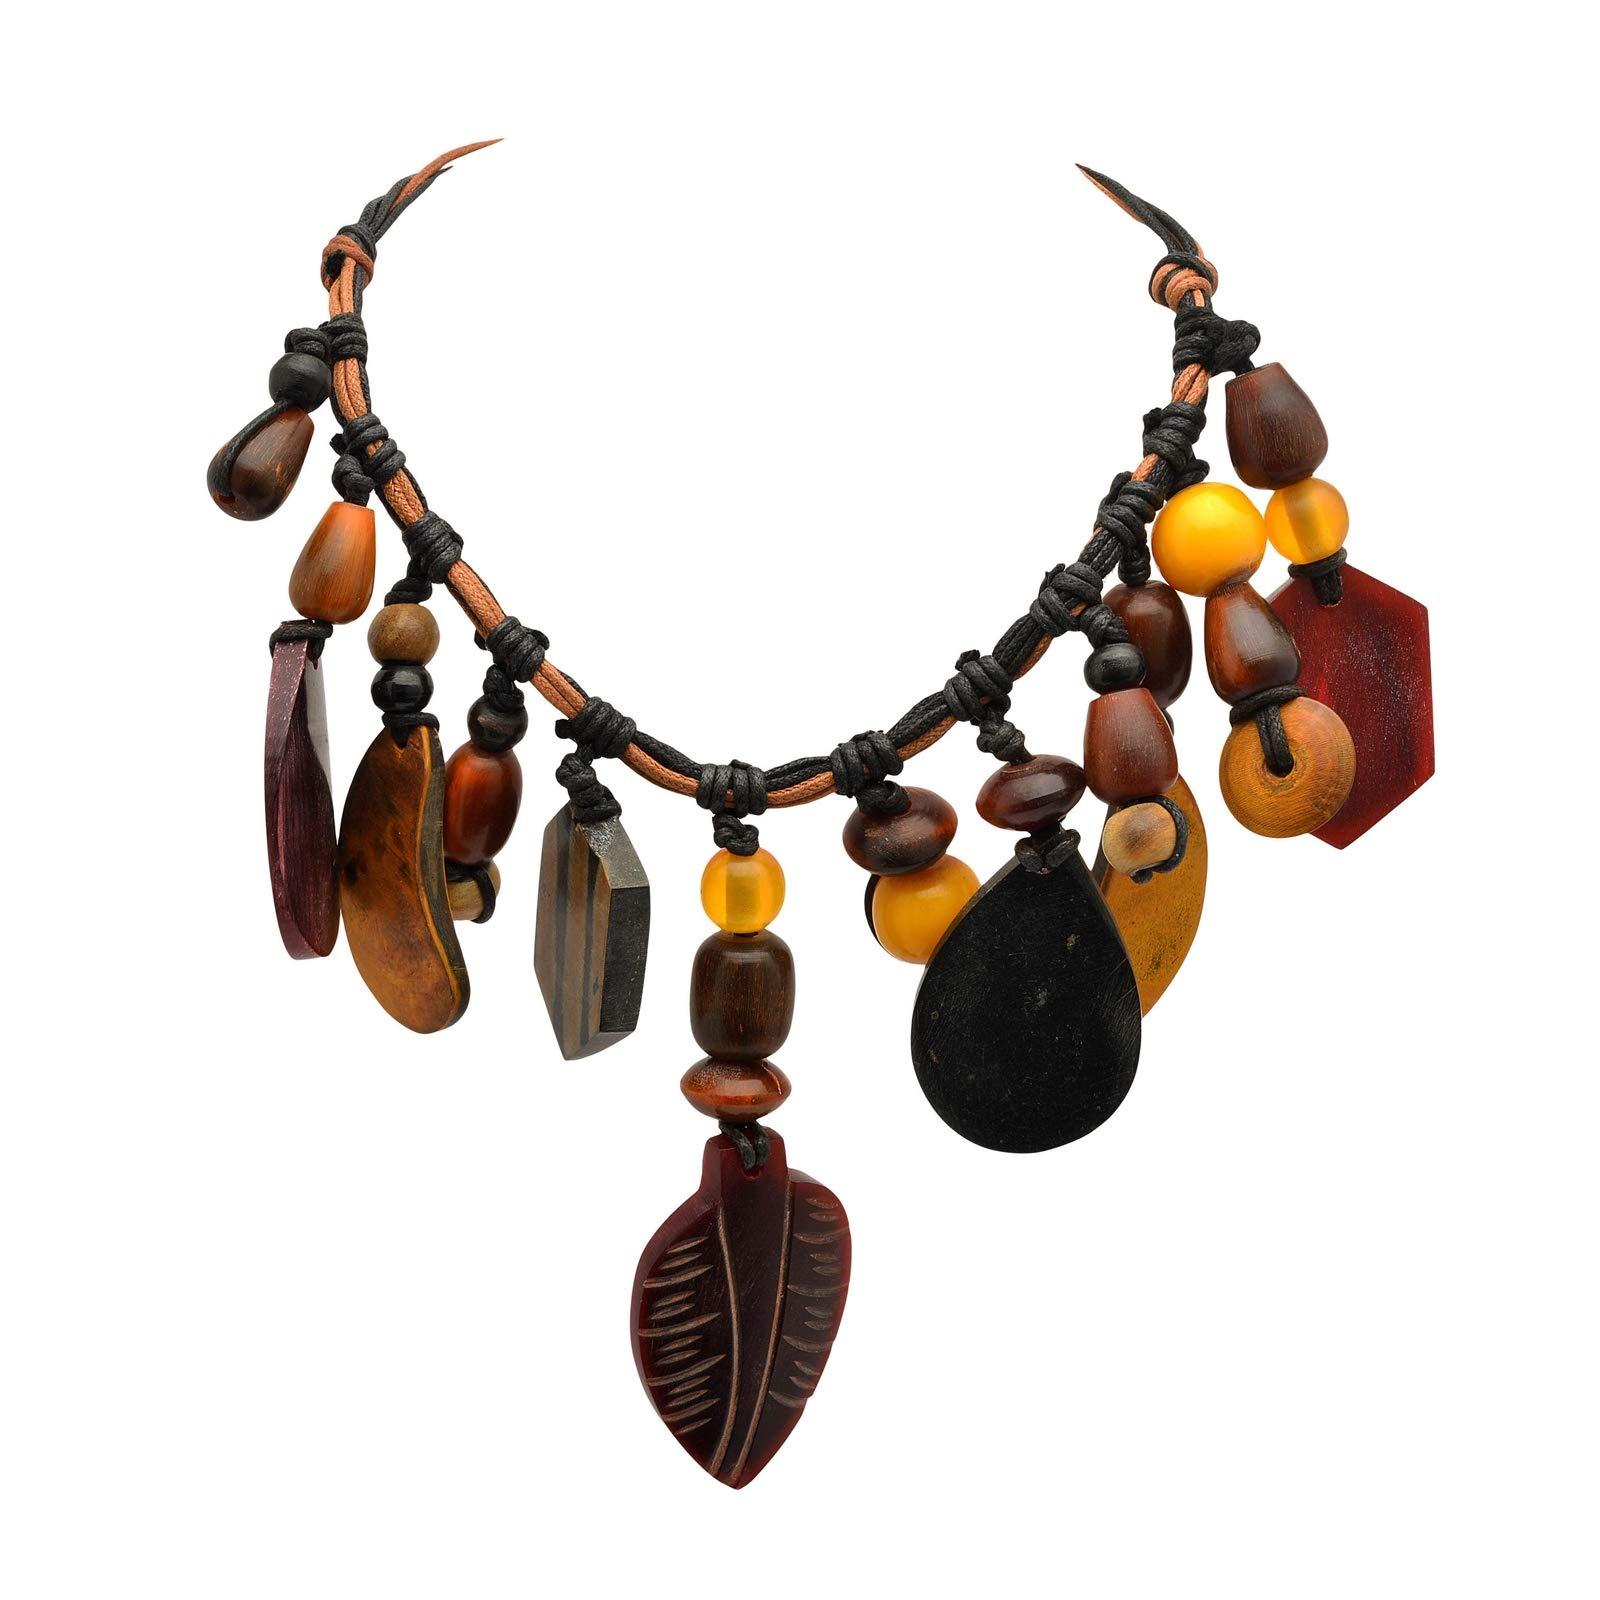 Zephyrr Pendant Necklace for Women Tibetan Style Modern Wood Glass Beads in Dori